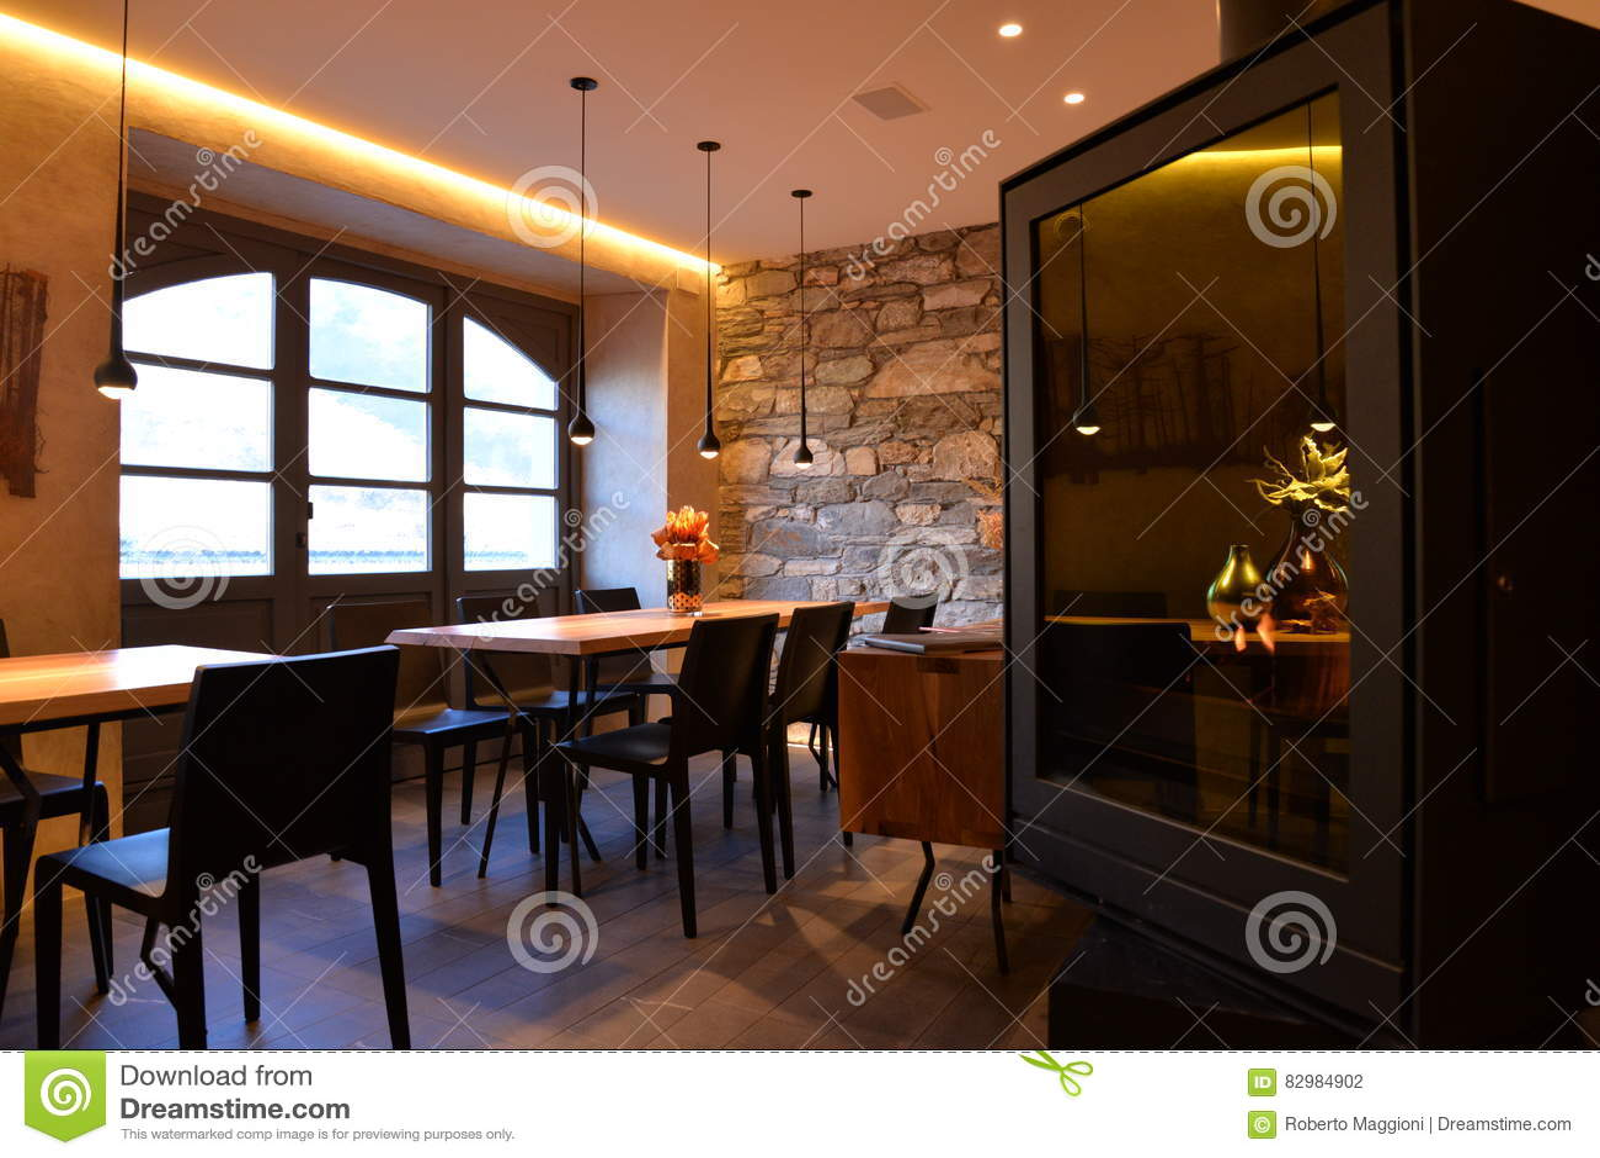 Modern Restaurant Interior Design. Stylish Dining Room Stock Photo ...